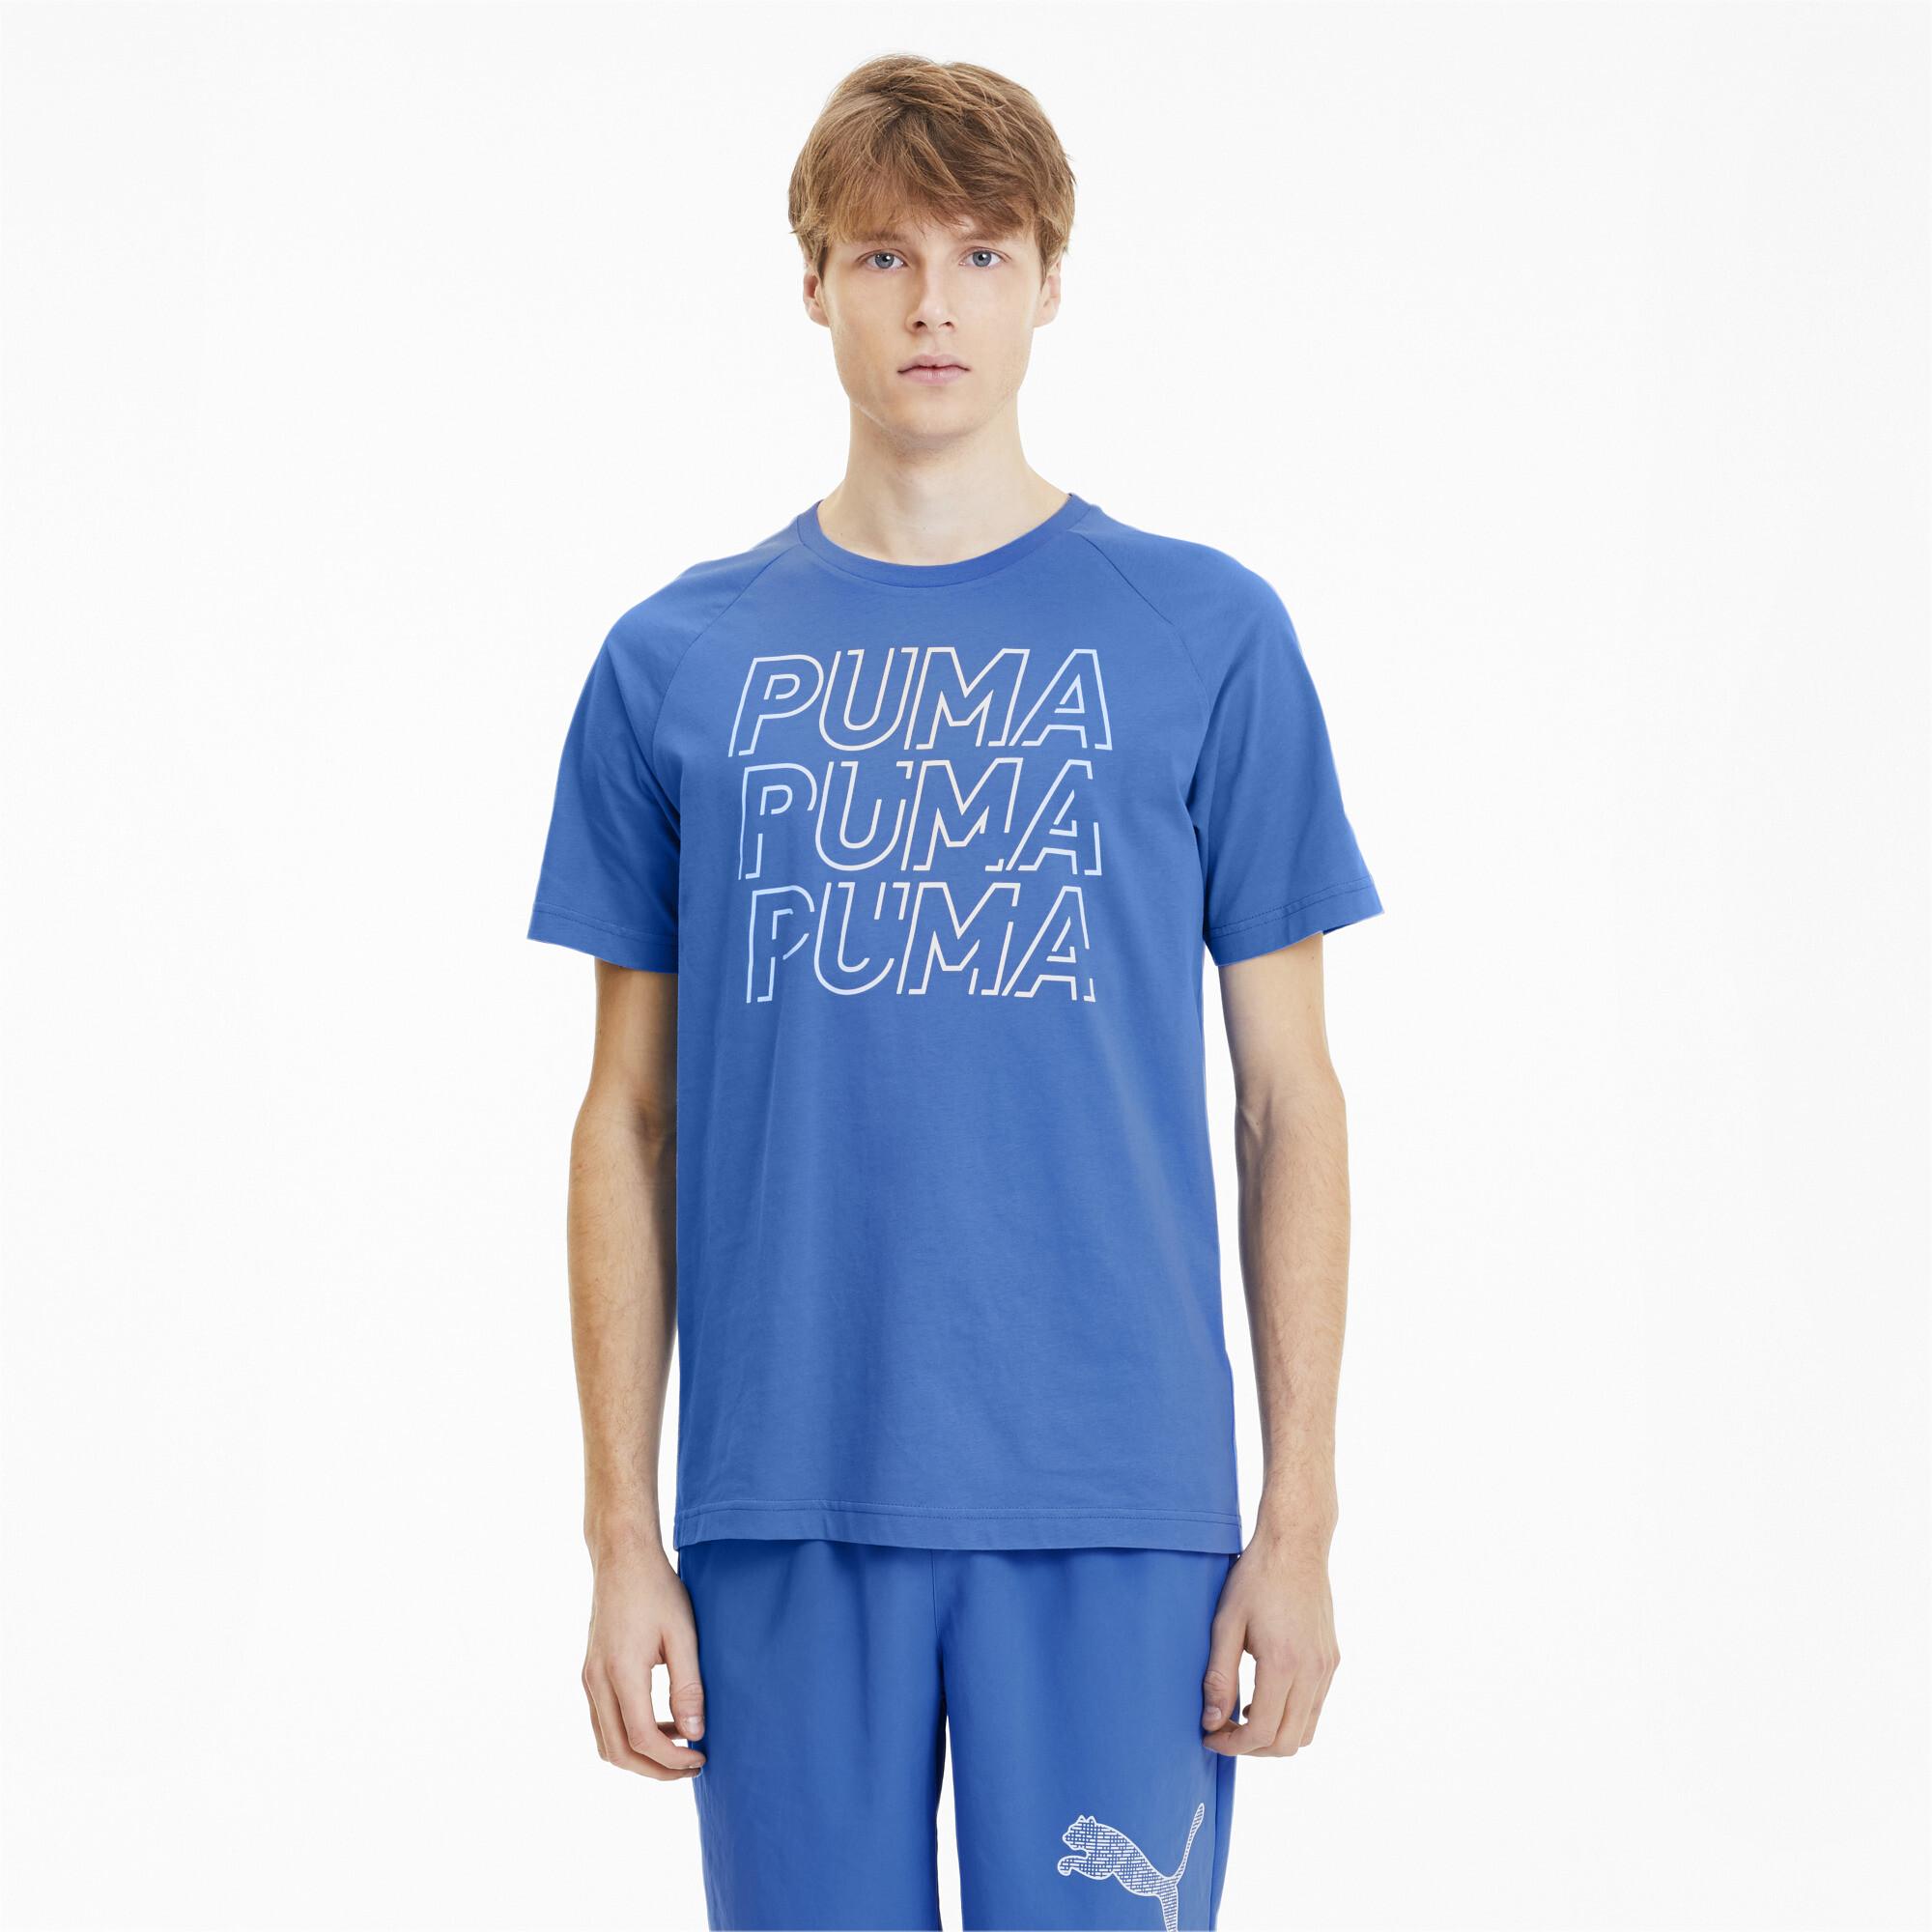 PUMA-Modern-Sports-Men-039-s-Logo-Tee-Men-Tee-Basics thumbnail 13